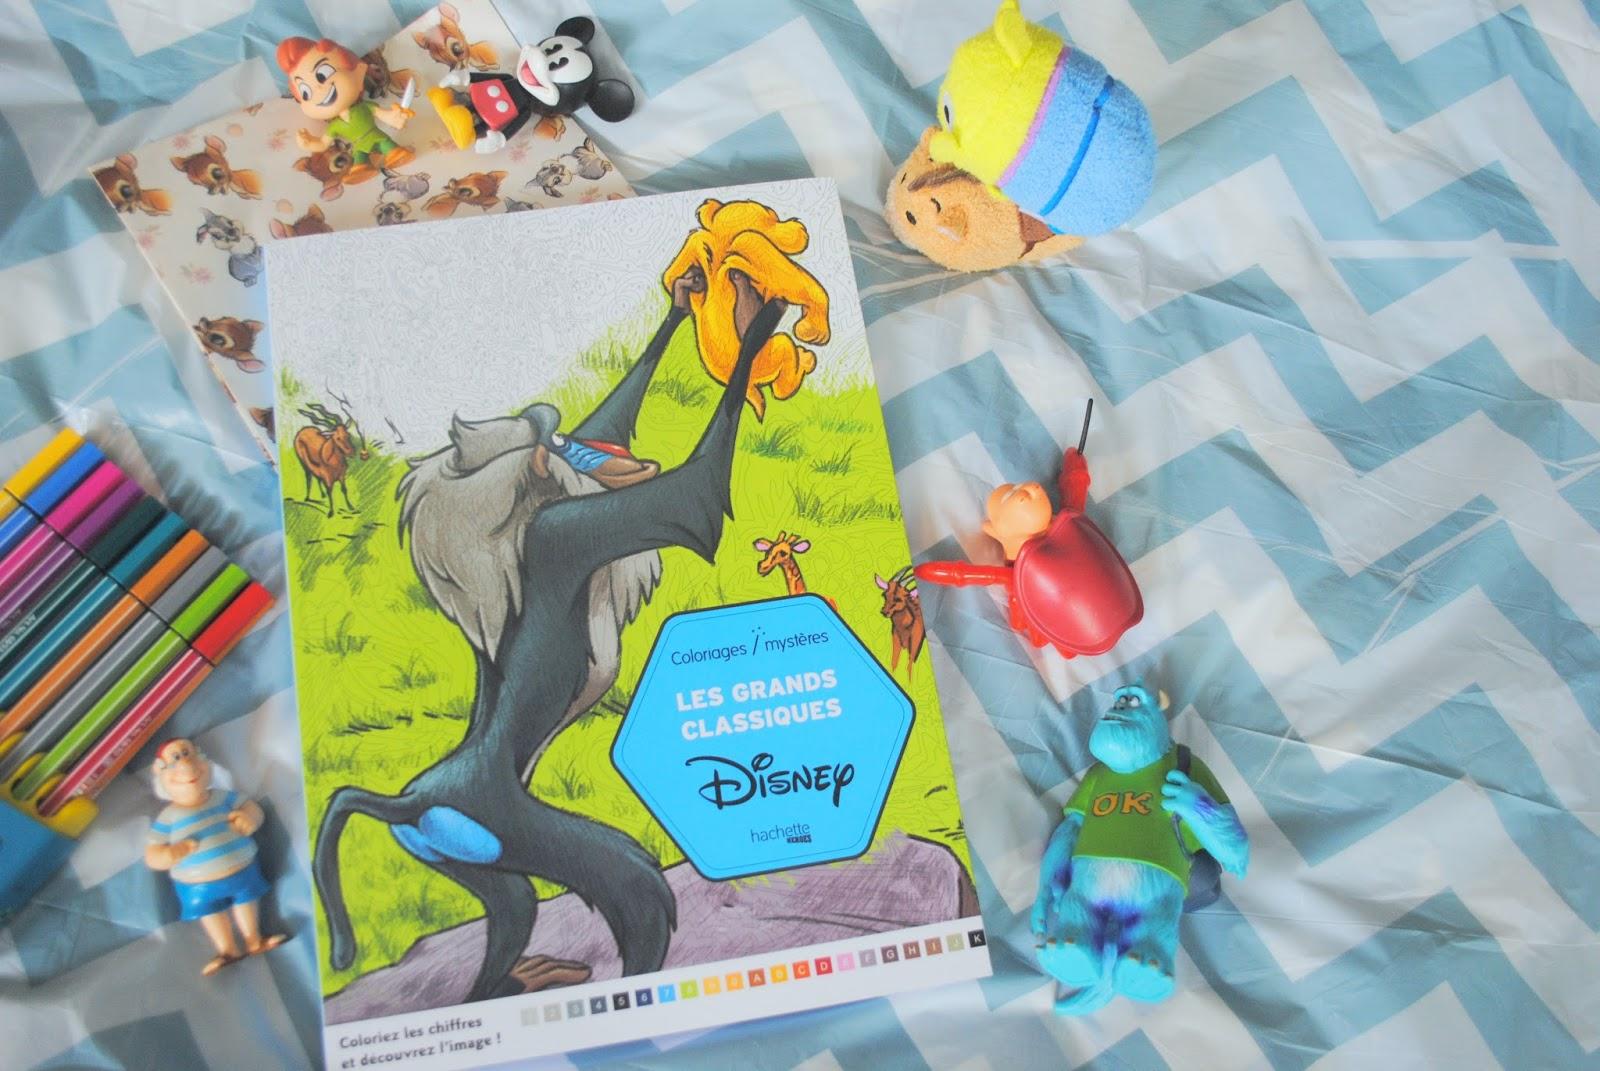 Les Grands Classiques Disney A Colorier